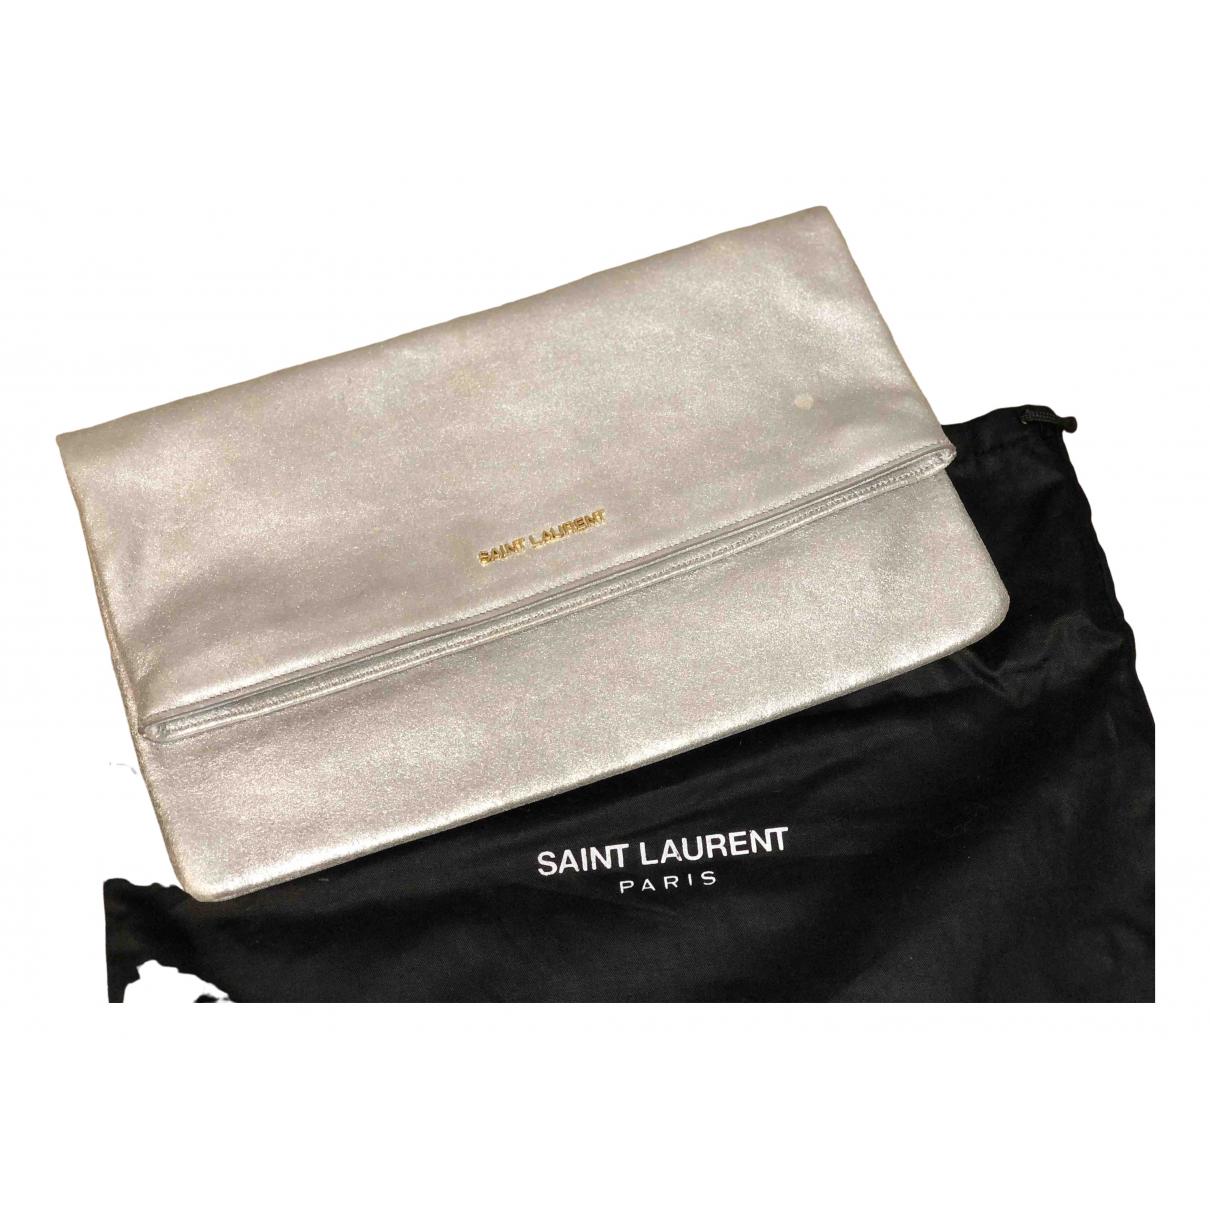 Saint Laurent \N Silver Leather Clutch bag for Women \N